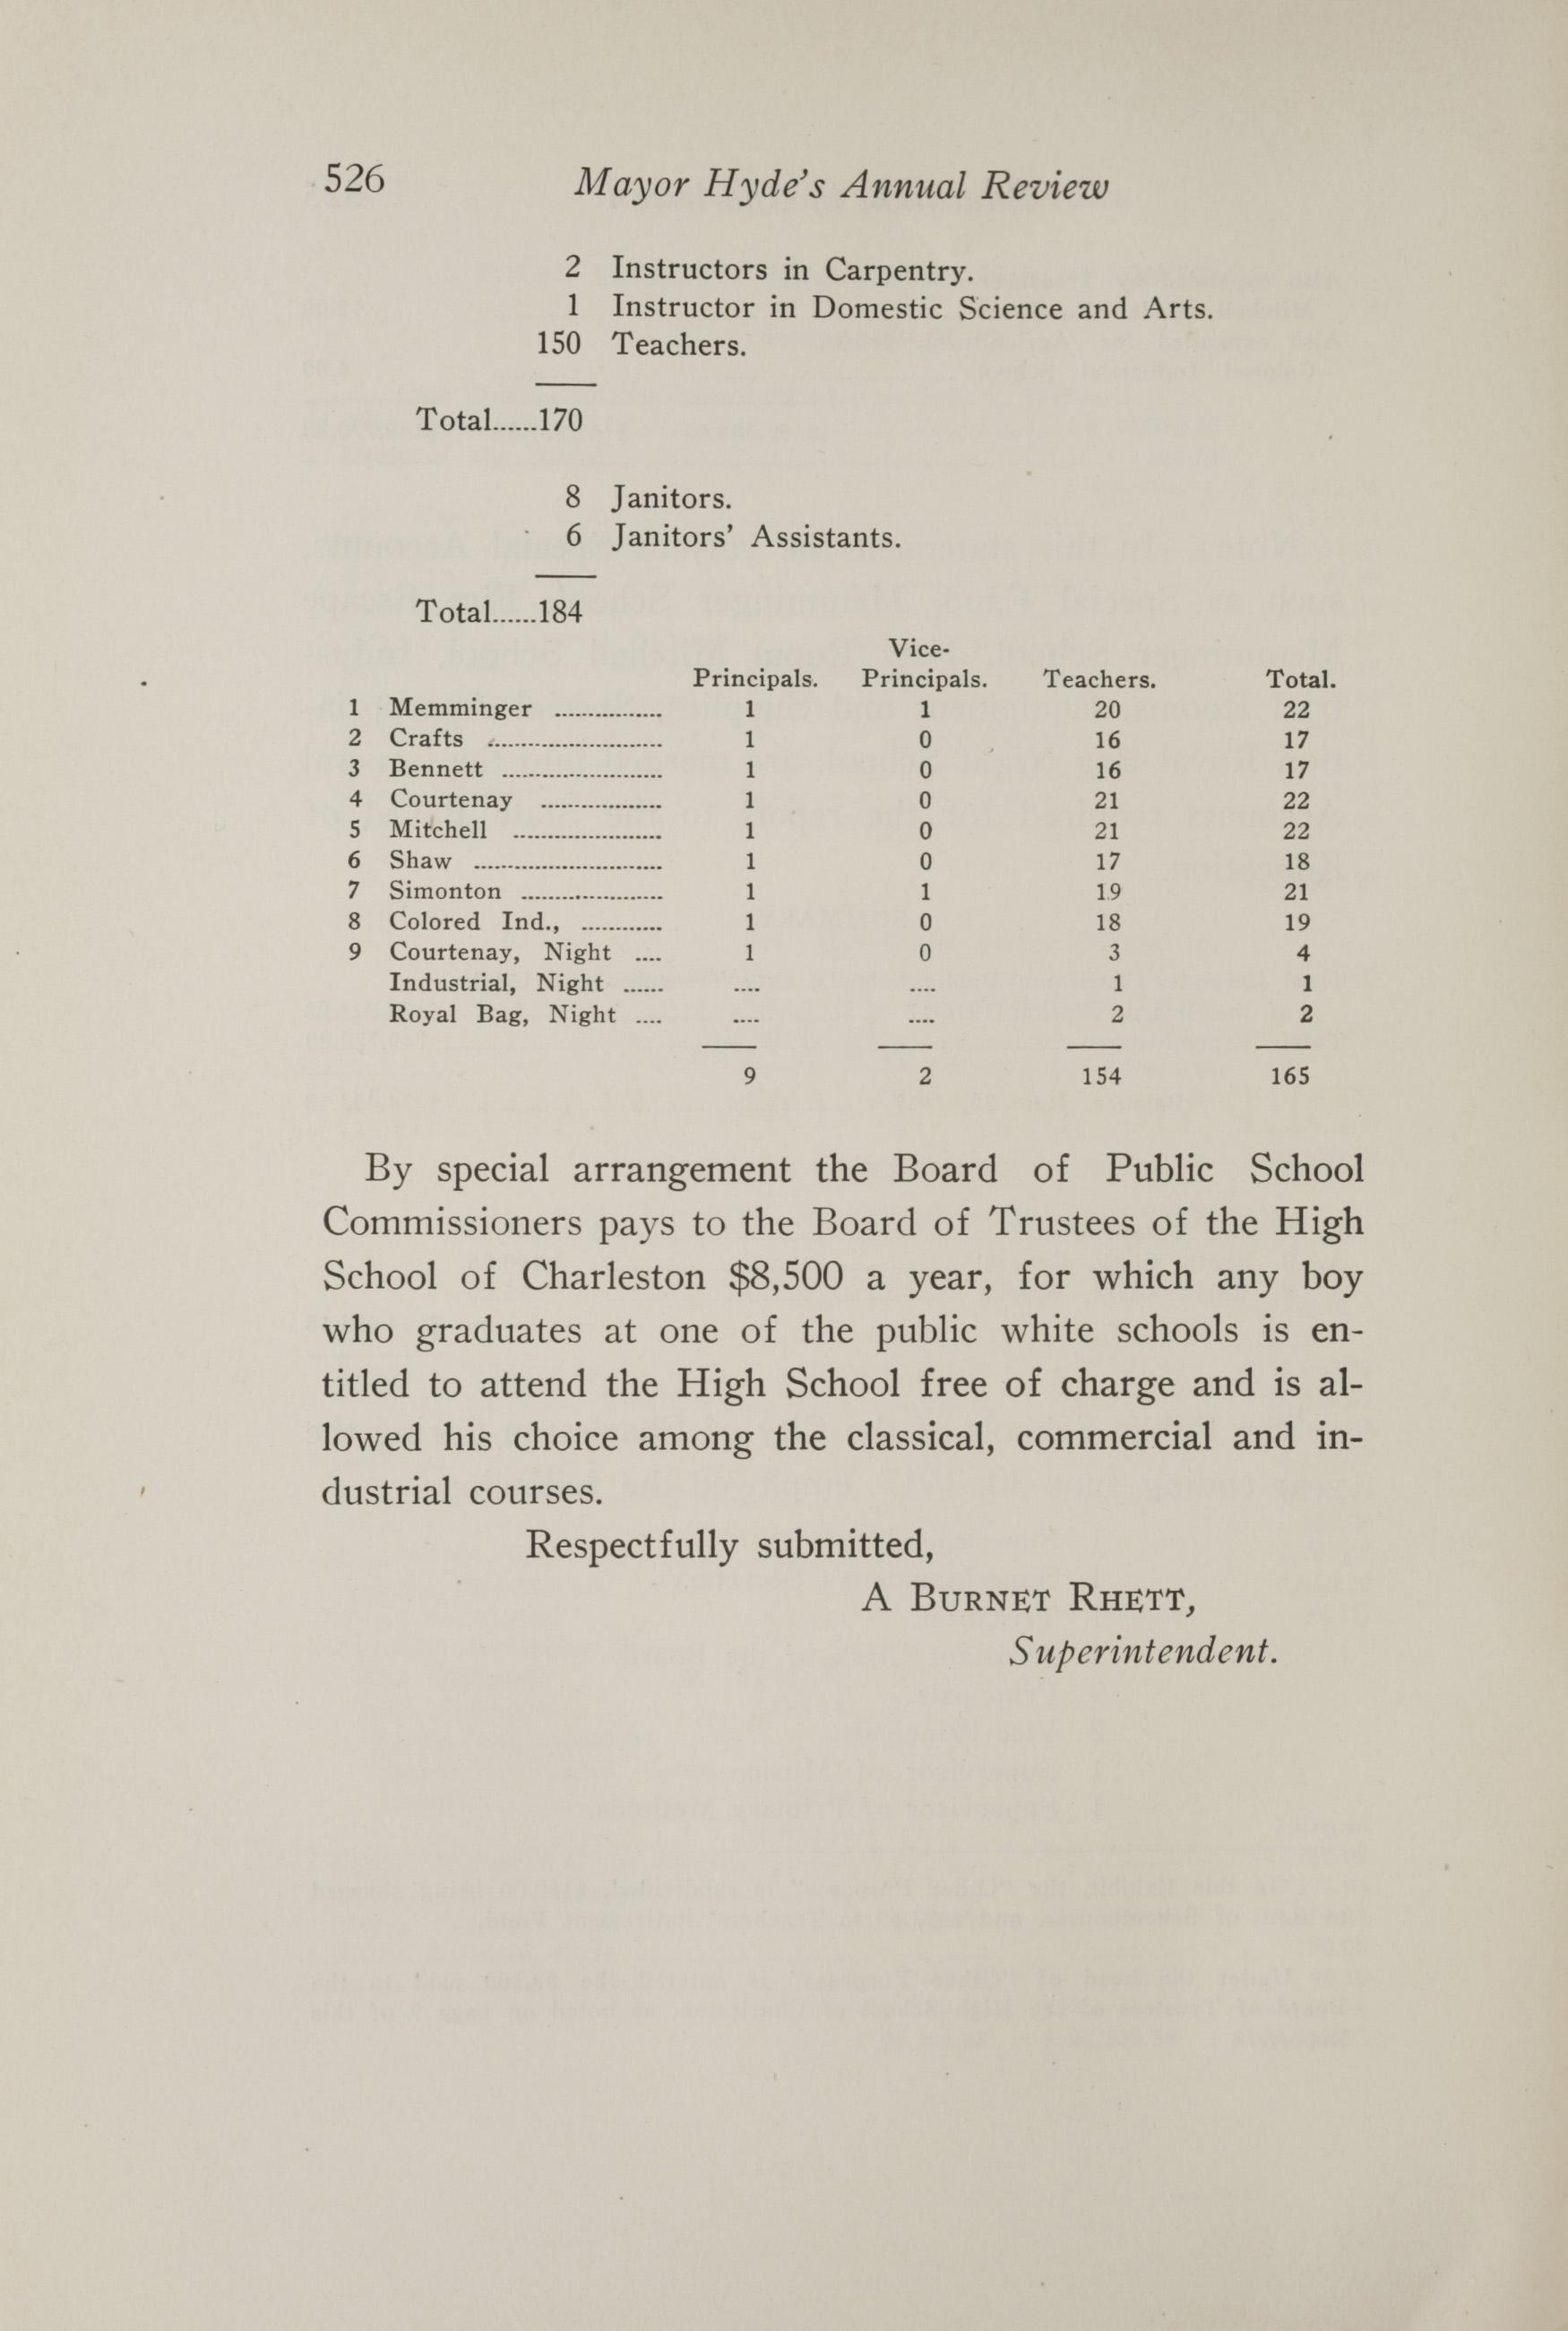 Charleston Yearbook, 1917, page 526